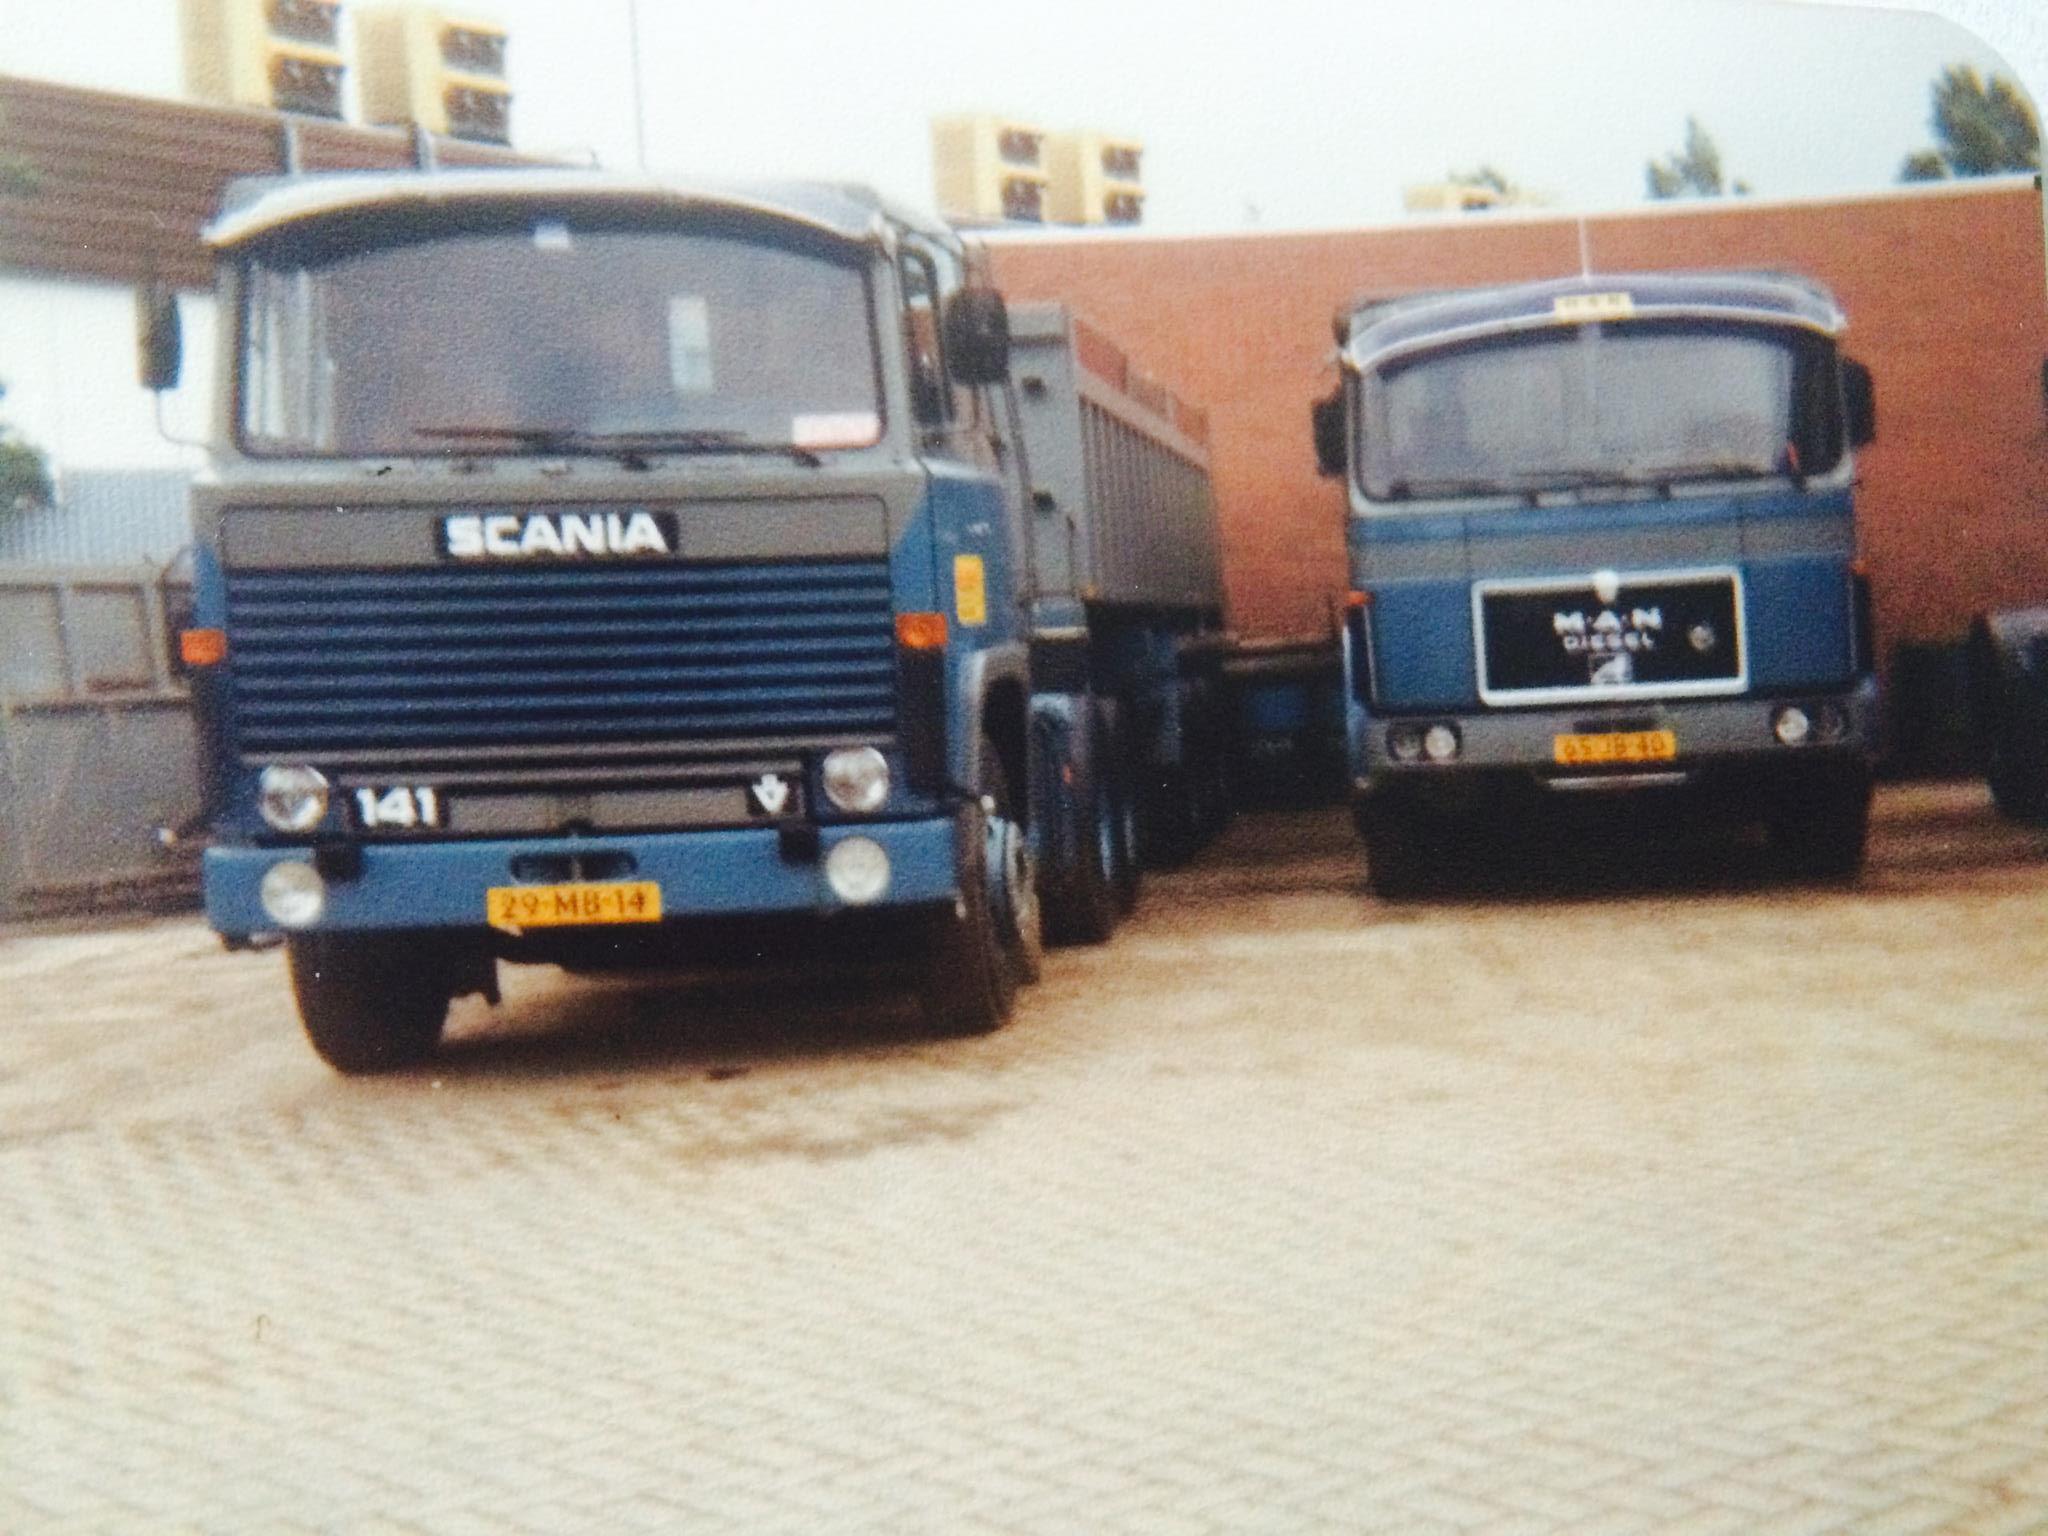 Scania--MAN-29-MB-14-tandemasser-van-Dolf-en-65-JB-40-van-Jan